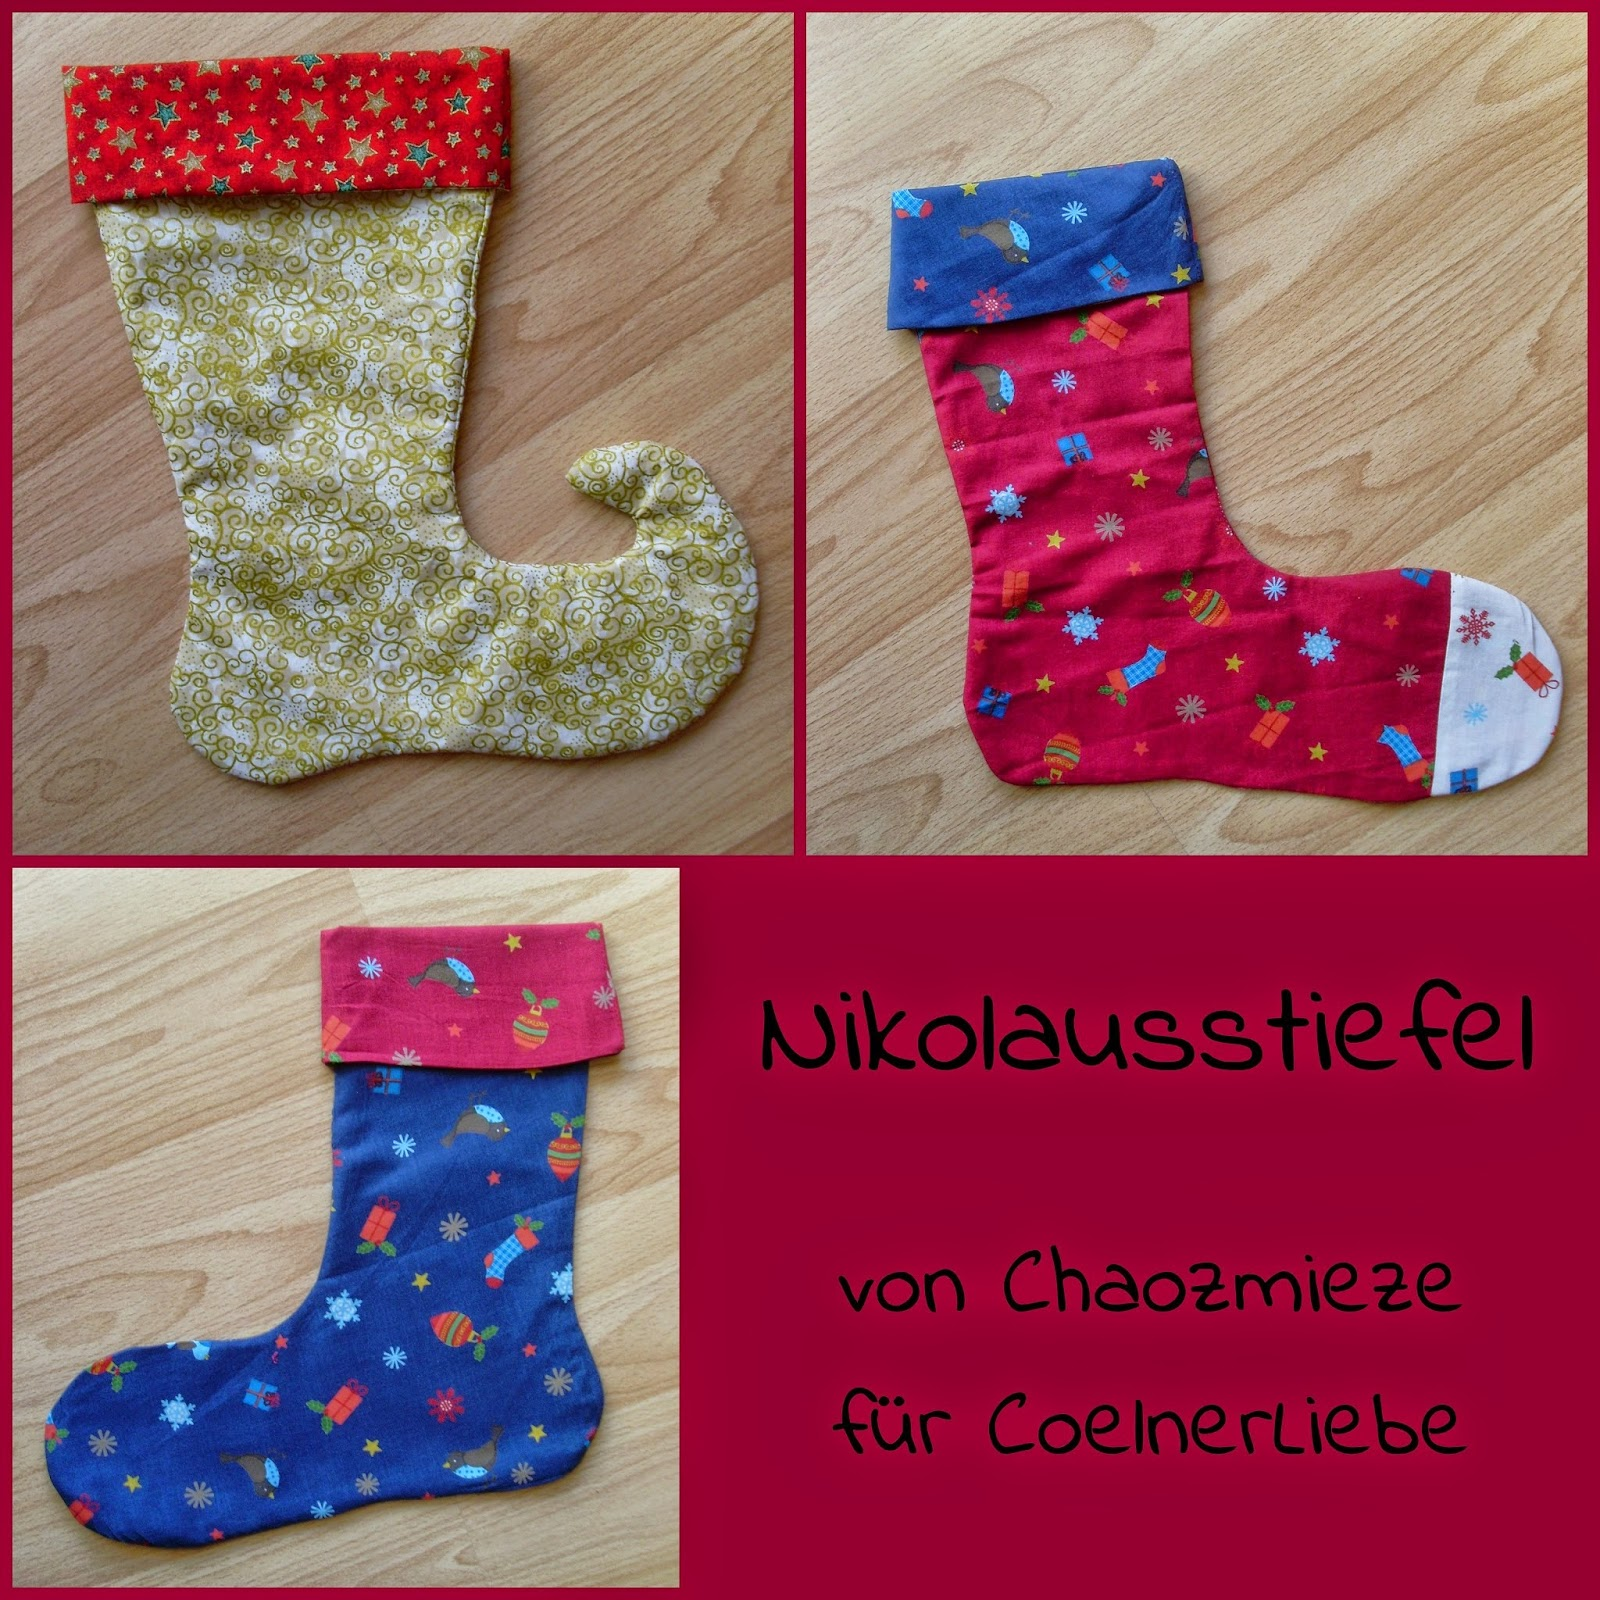 http://chaozmieze.blogspot.de/2014/11/probenahen-fur-coelnerliebe-freebook.html